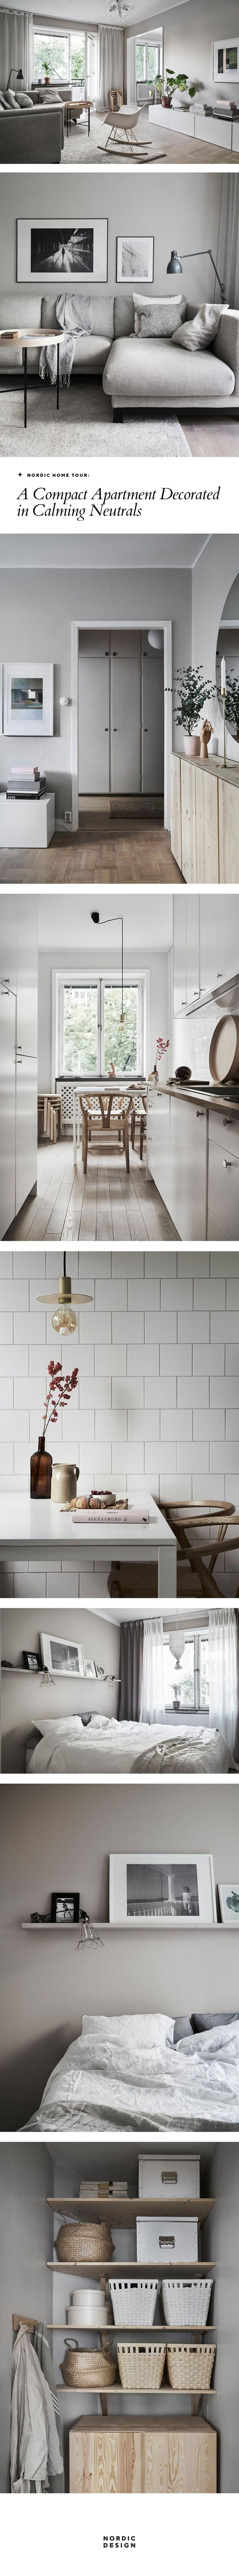 119 best Home Interior Design images on Pinterest